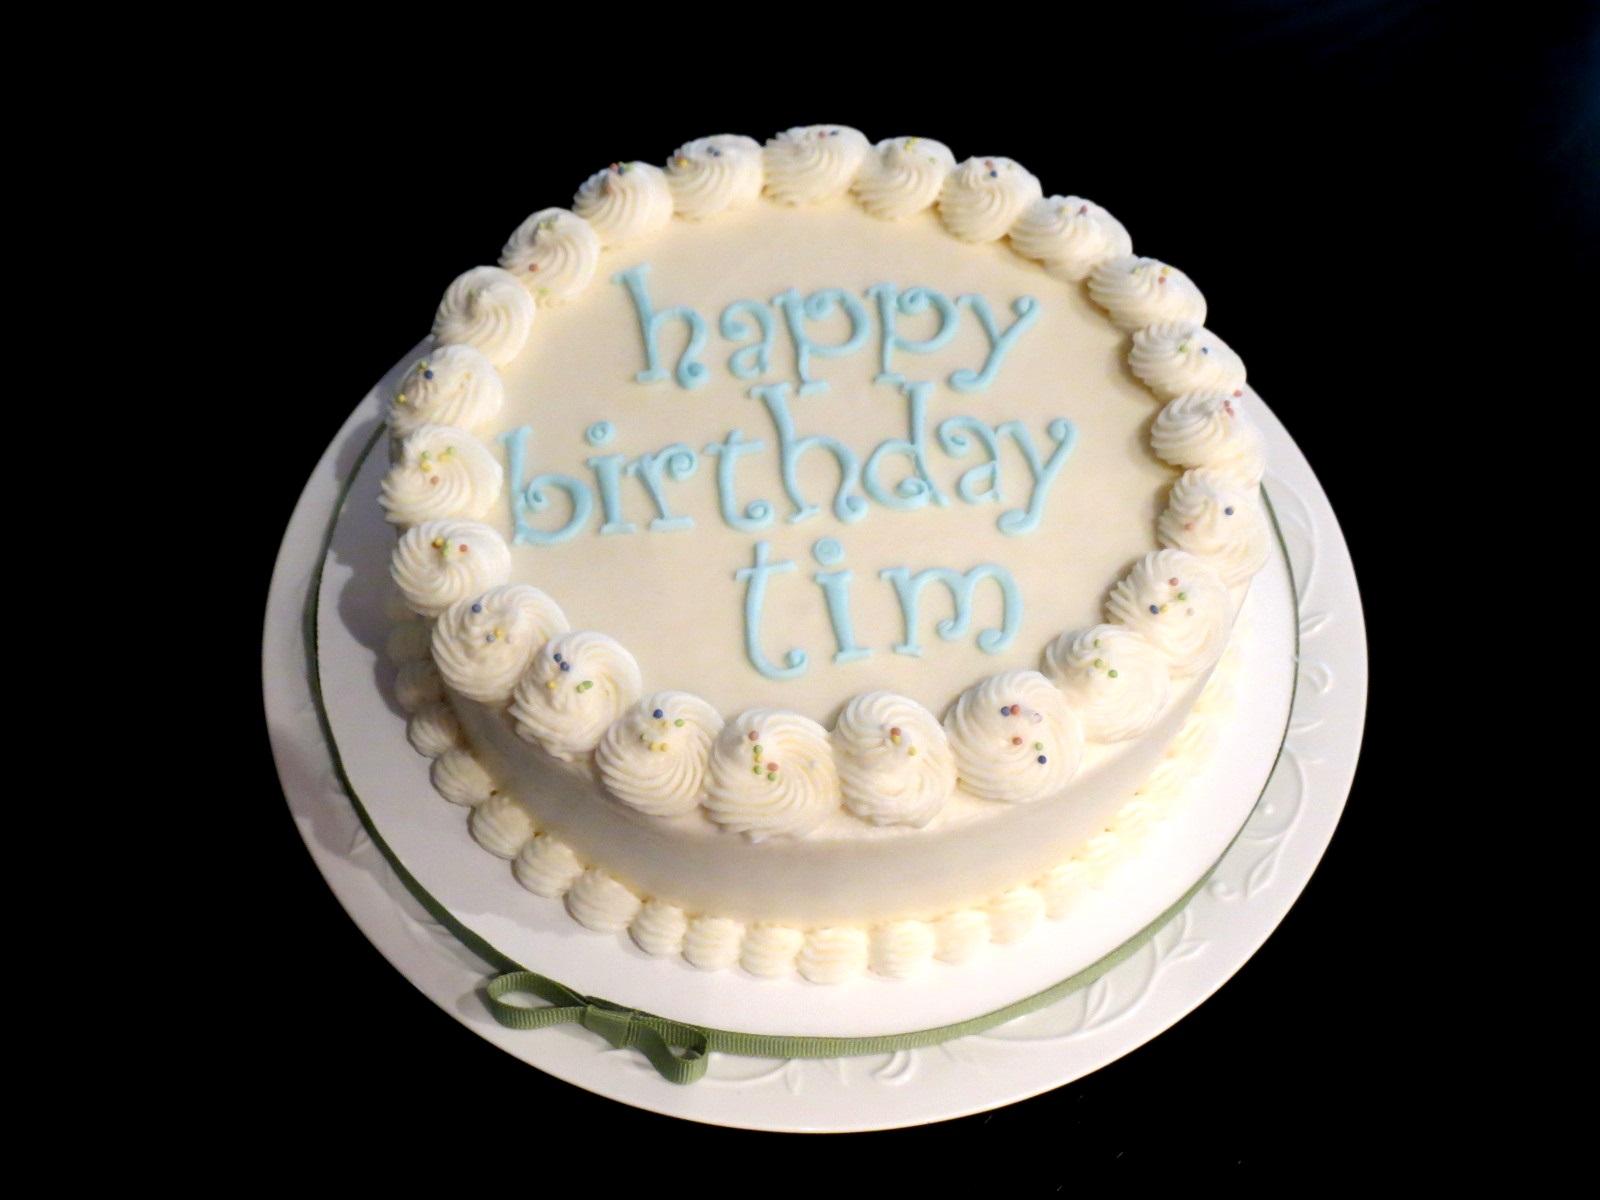 Special Diet Birthday Cake